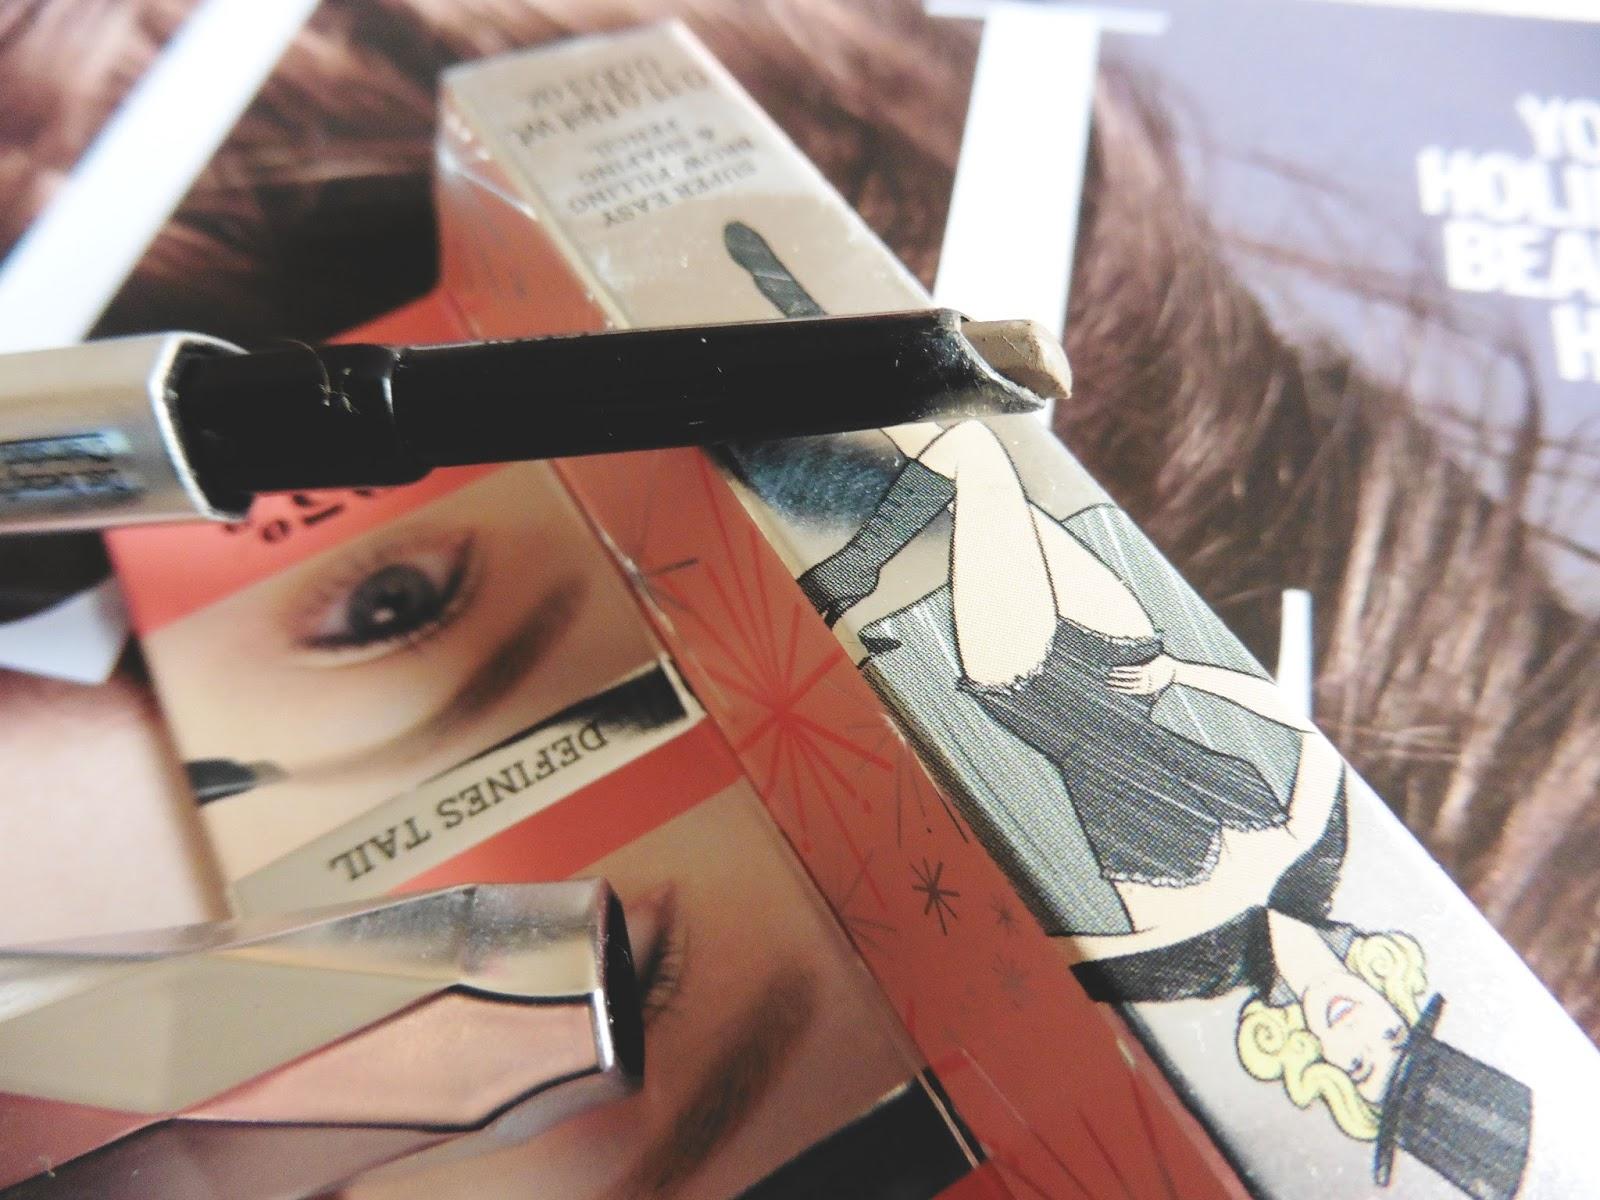 lebellelavie - Introducing the Benefit Goof Proof Brow Pencil